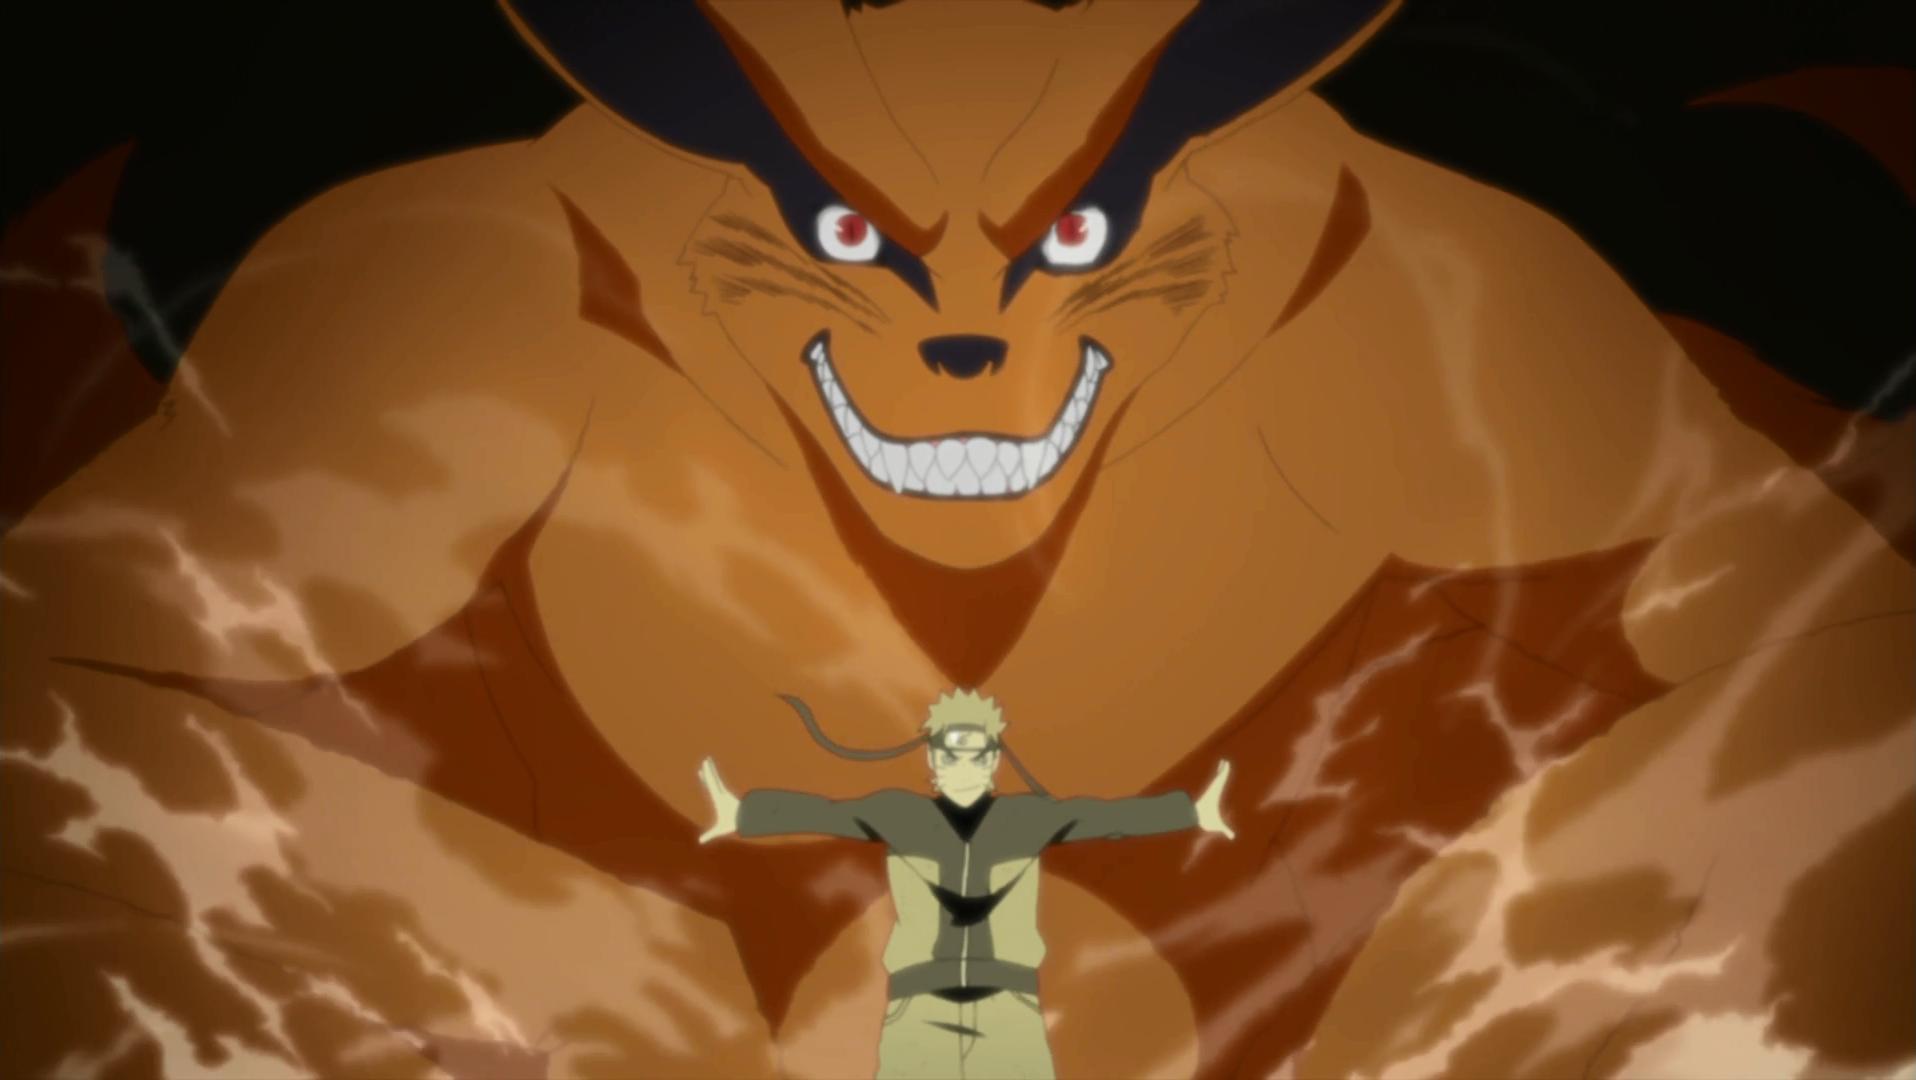 Leaked Boruto Manga - Naruto Is Alive But Kurama Dies!